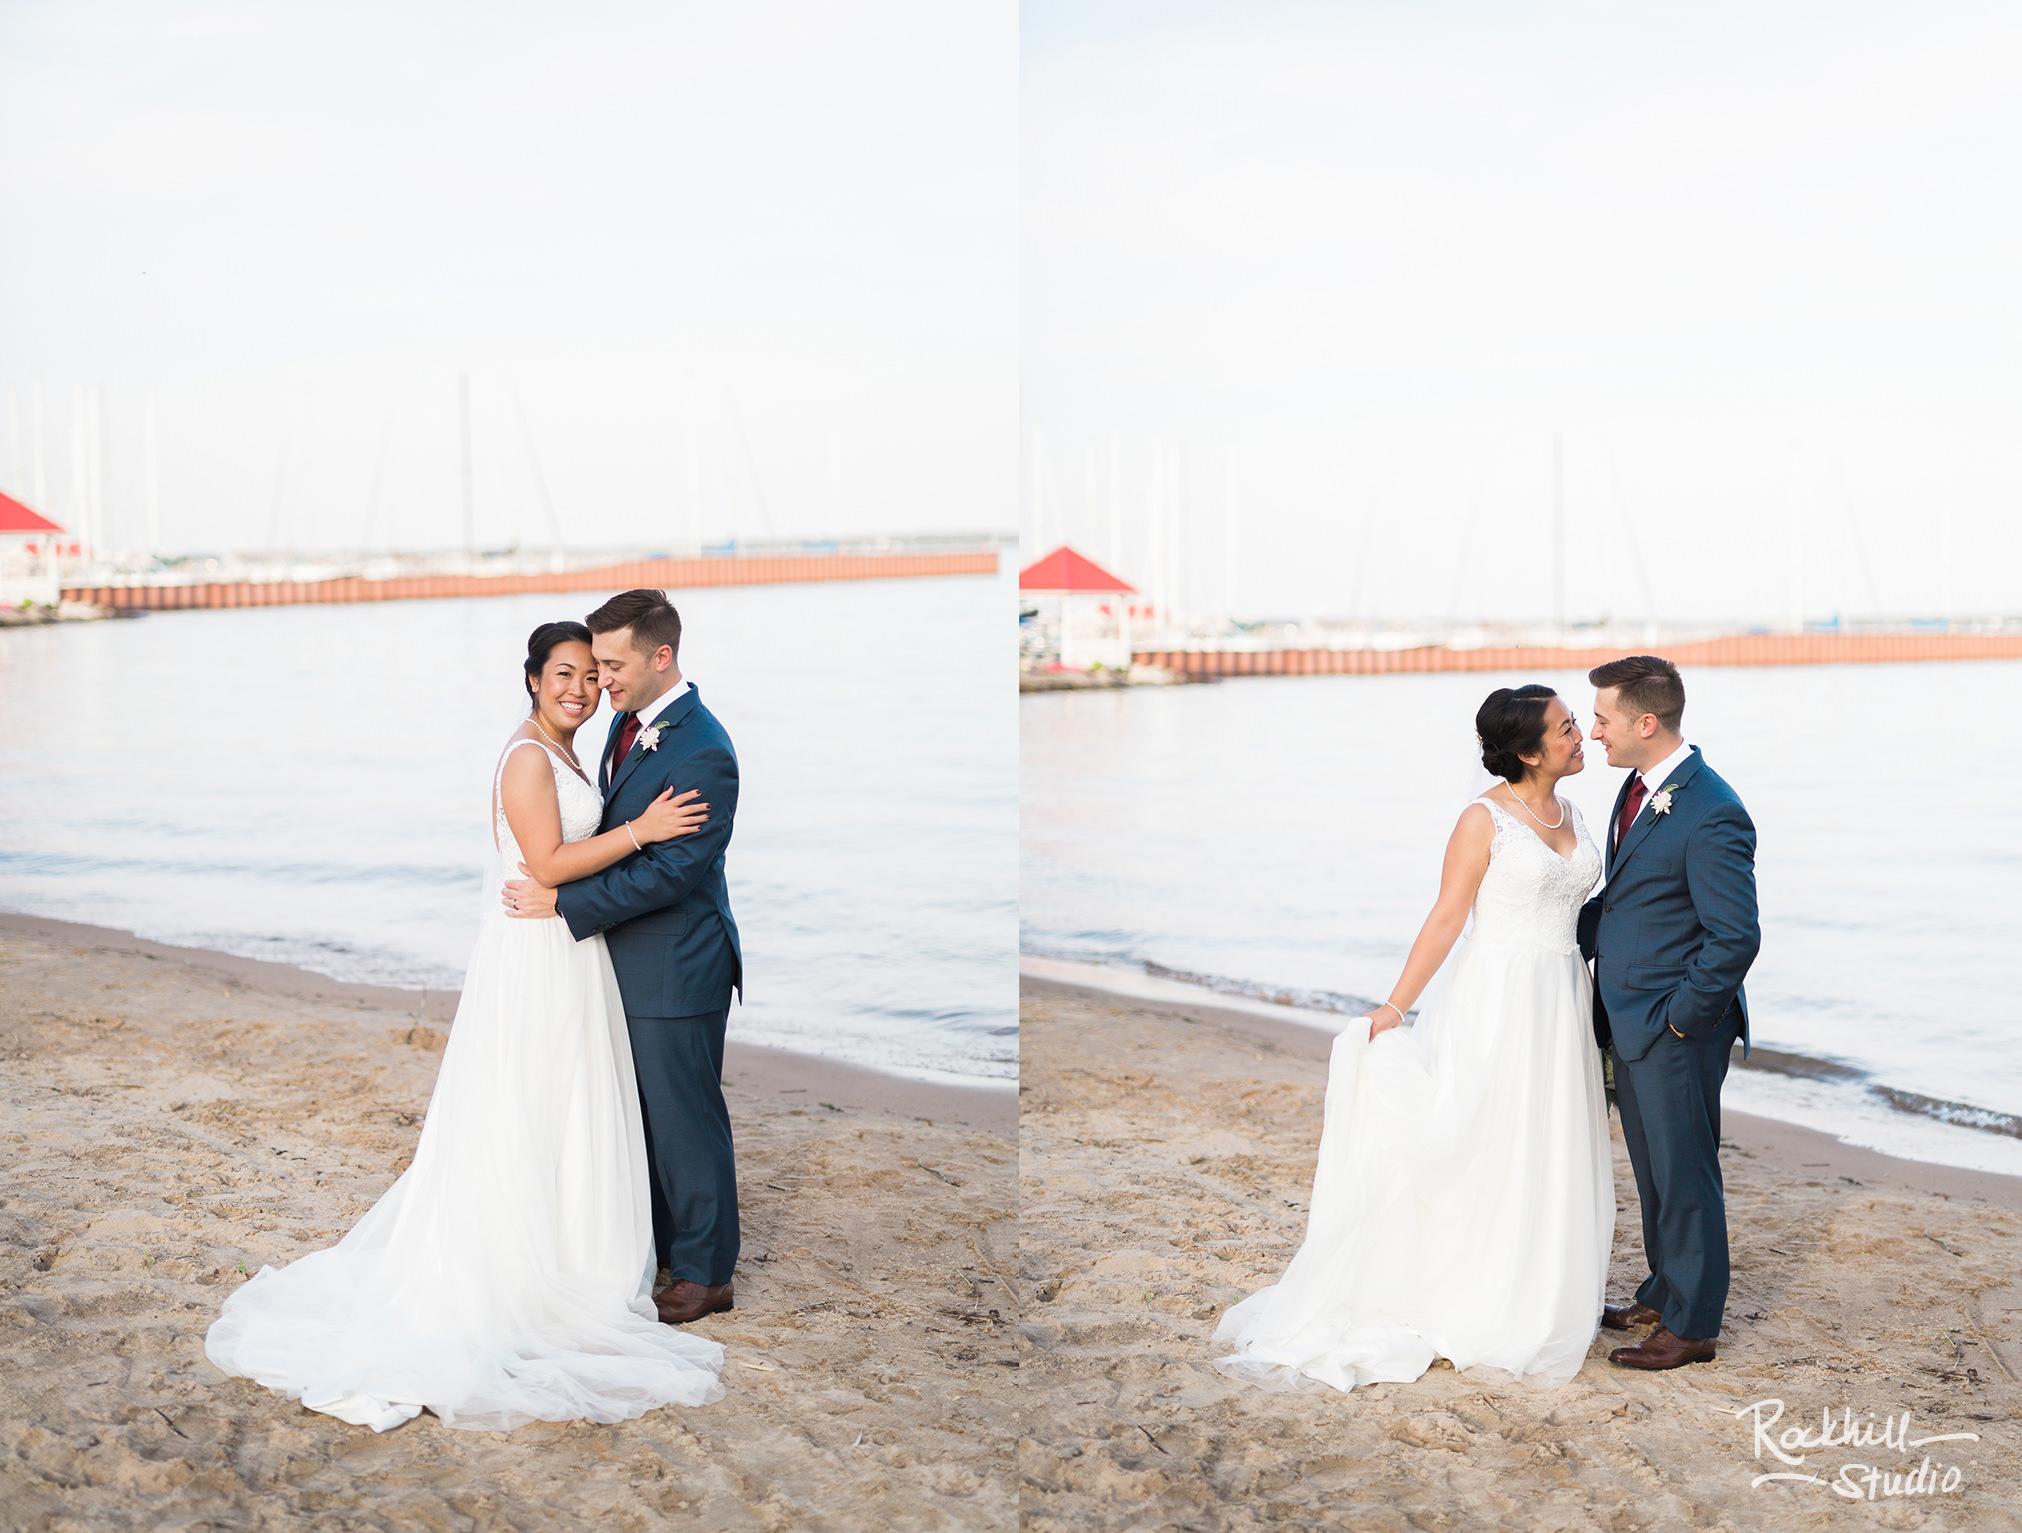 Northport wedding, bride and groom portrait, Traverse city wedding photographer Rockhill Studio